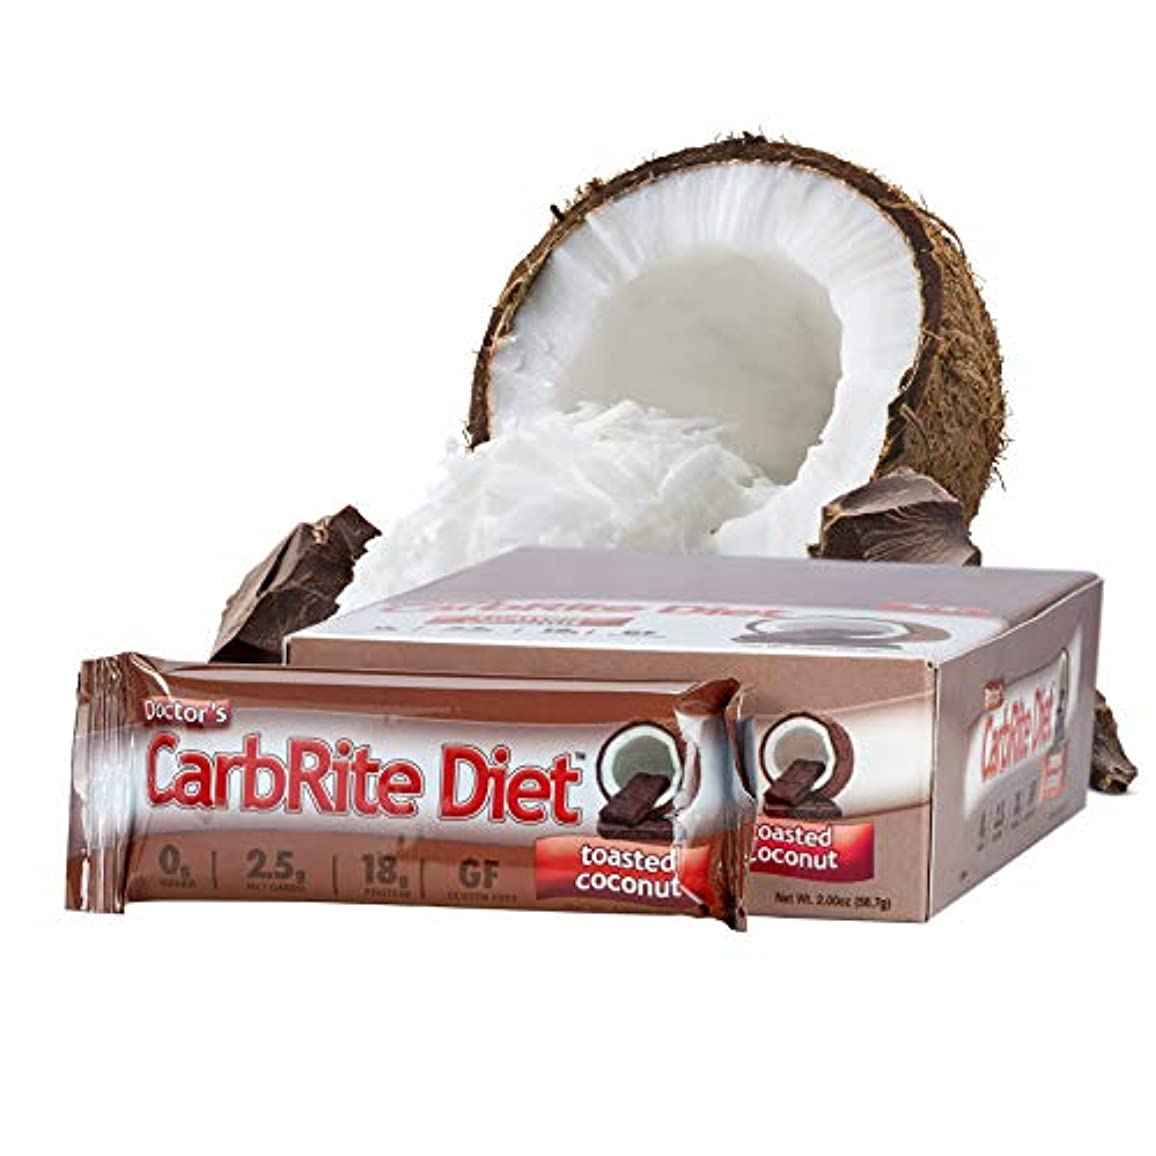 Universal Nutrition - Doctor's CarbRite ダイエット バー ボックス トースト ココナッツ - 1バー